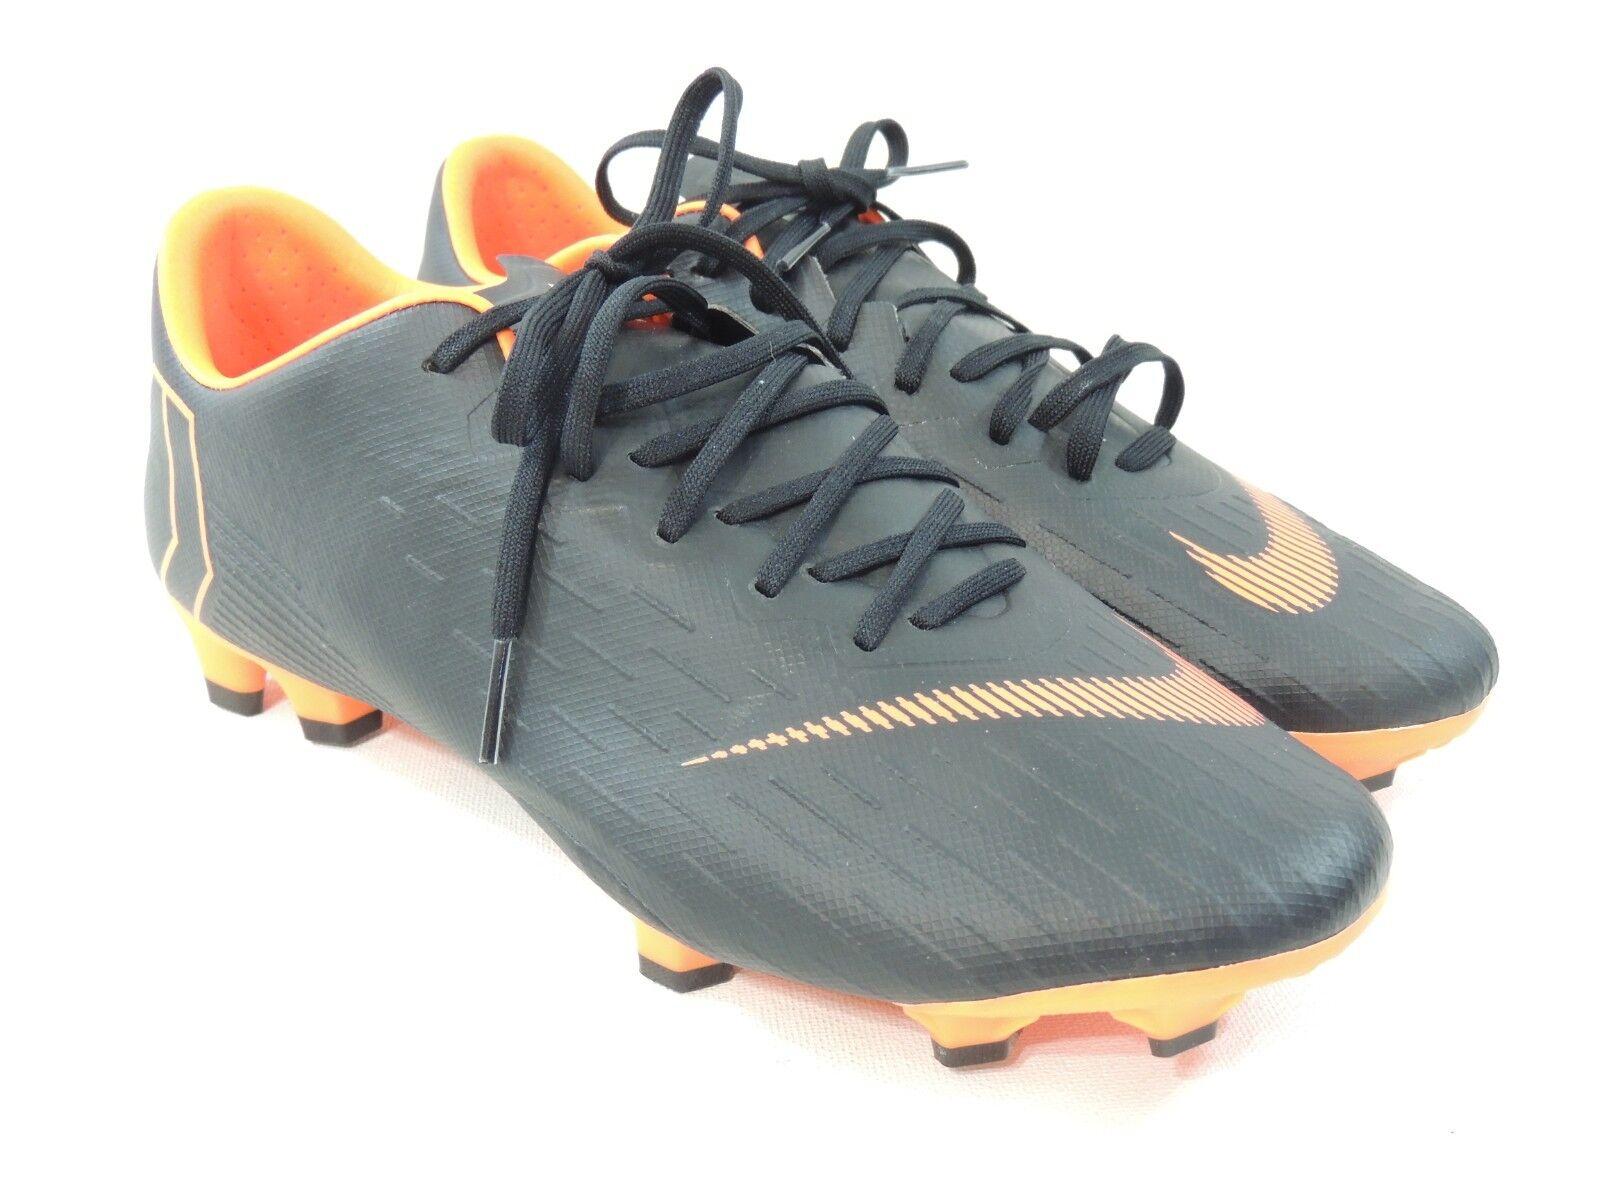 d6604a4ddb16 Nike Mercurial Vapor XII Pro Pro Pro FG Soccer Cleats Black orange  AH7382-081 Size